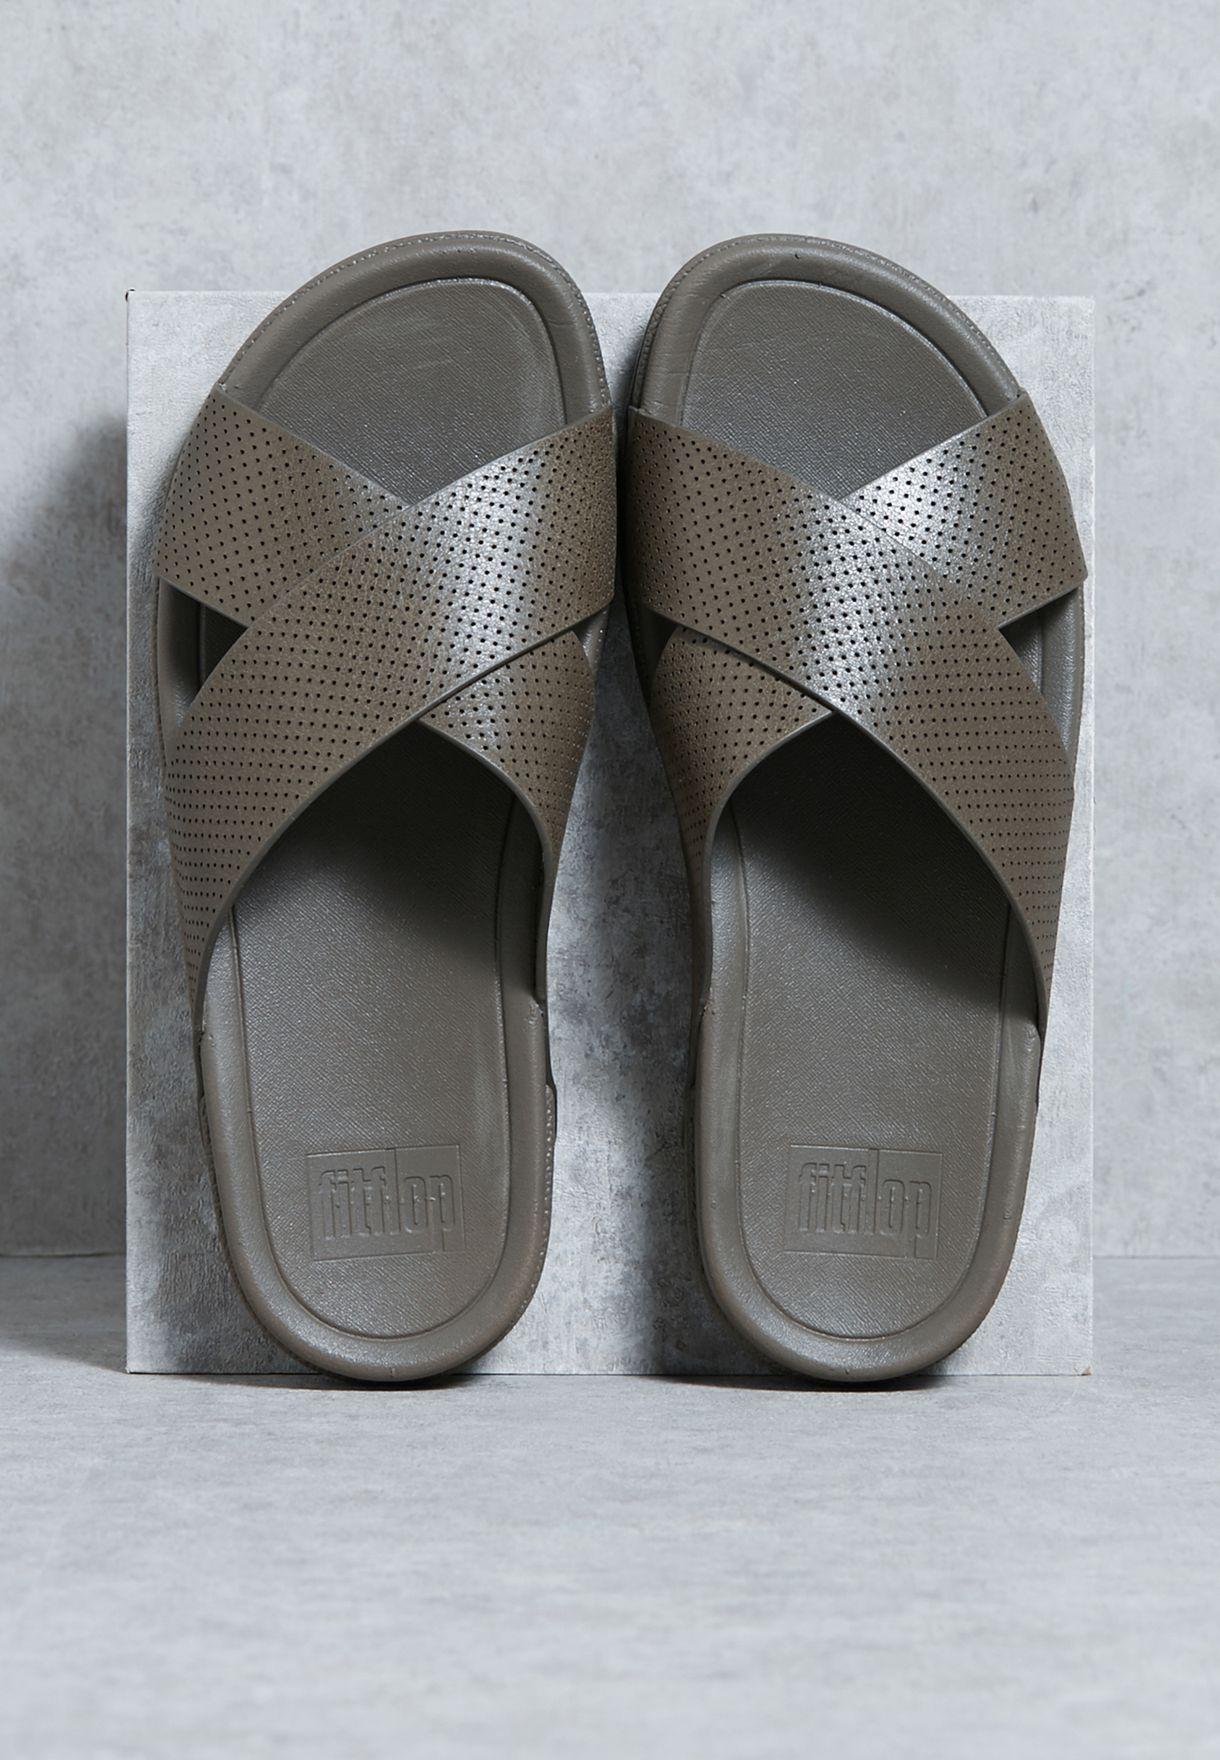 72f4e263da16 Shop Fitflop green Surfer Perf Slides C07-091 for Men in UAE ...